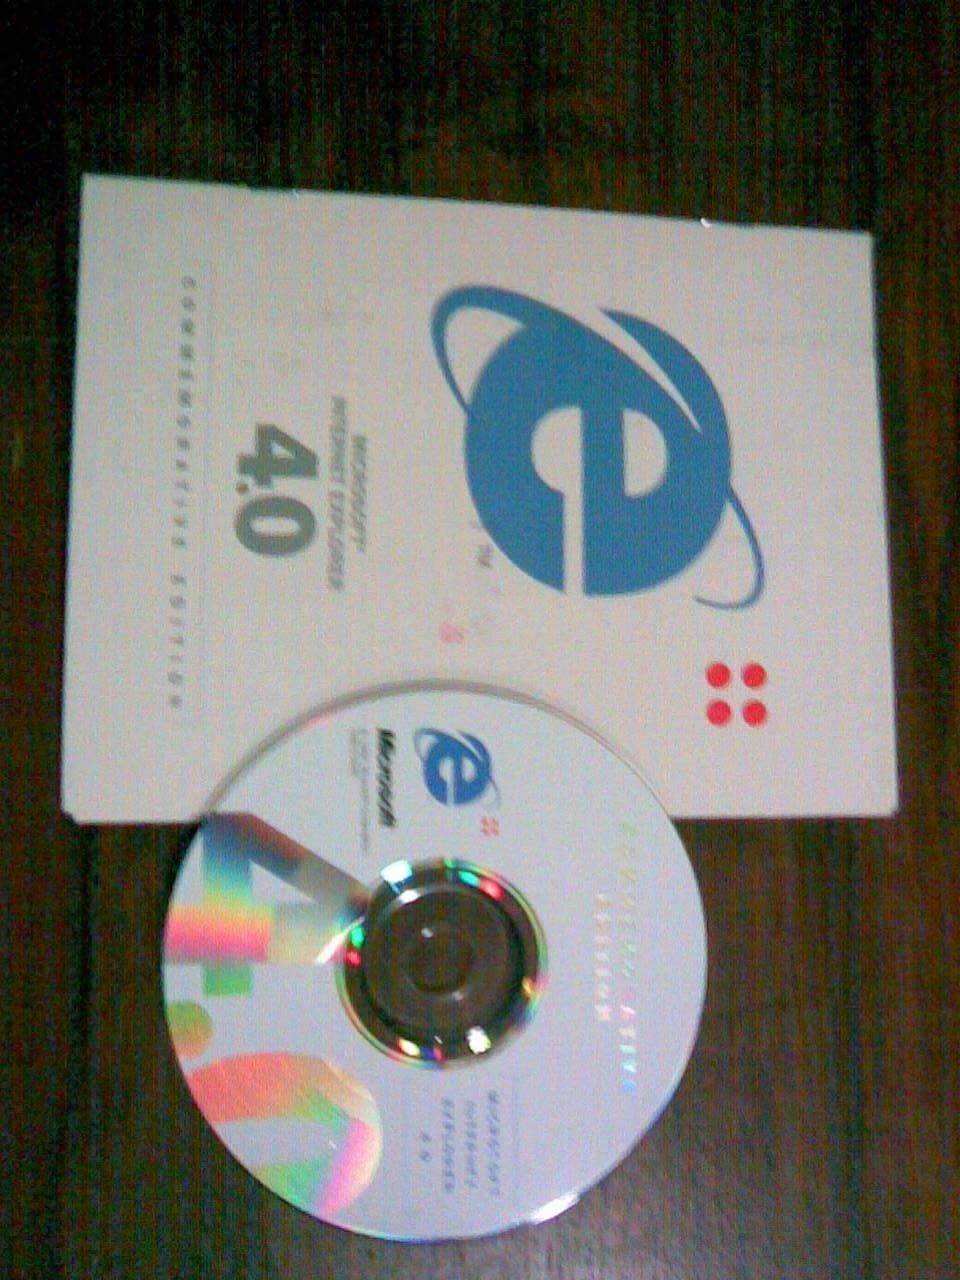 Disco de instalación de Internet Explorer 4.0